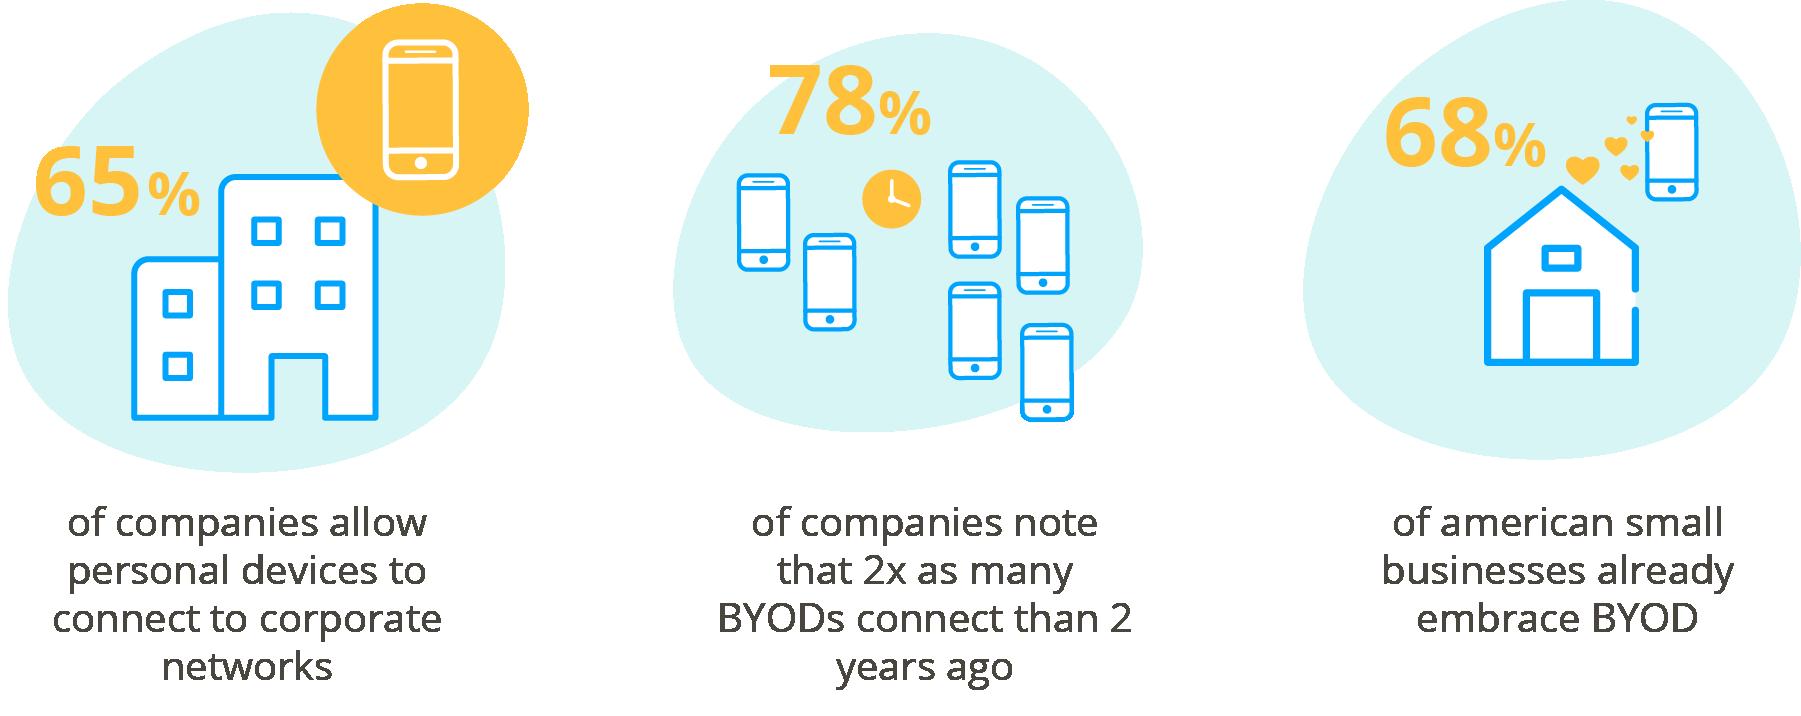 BYOD statistics, employee app